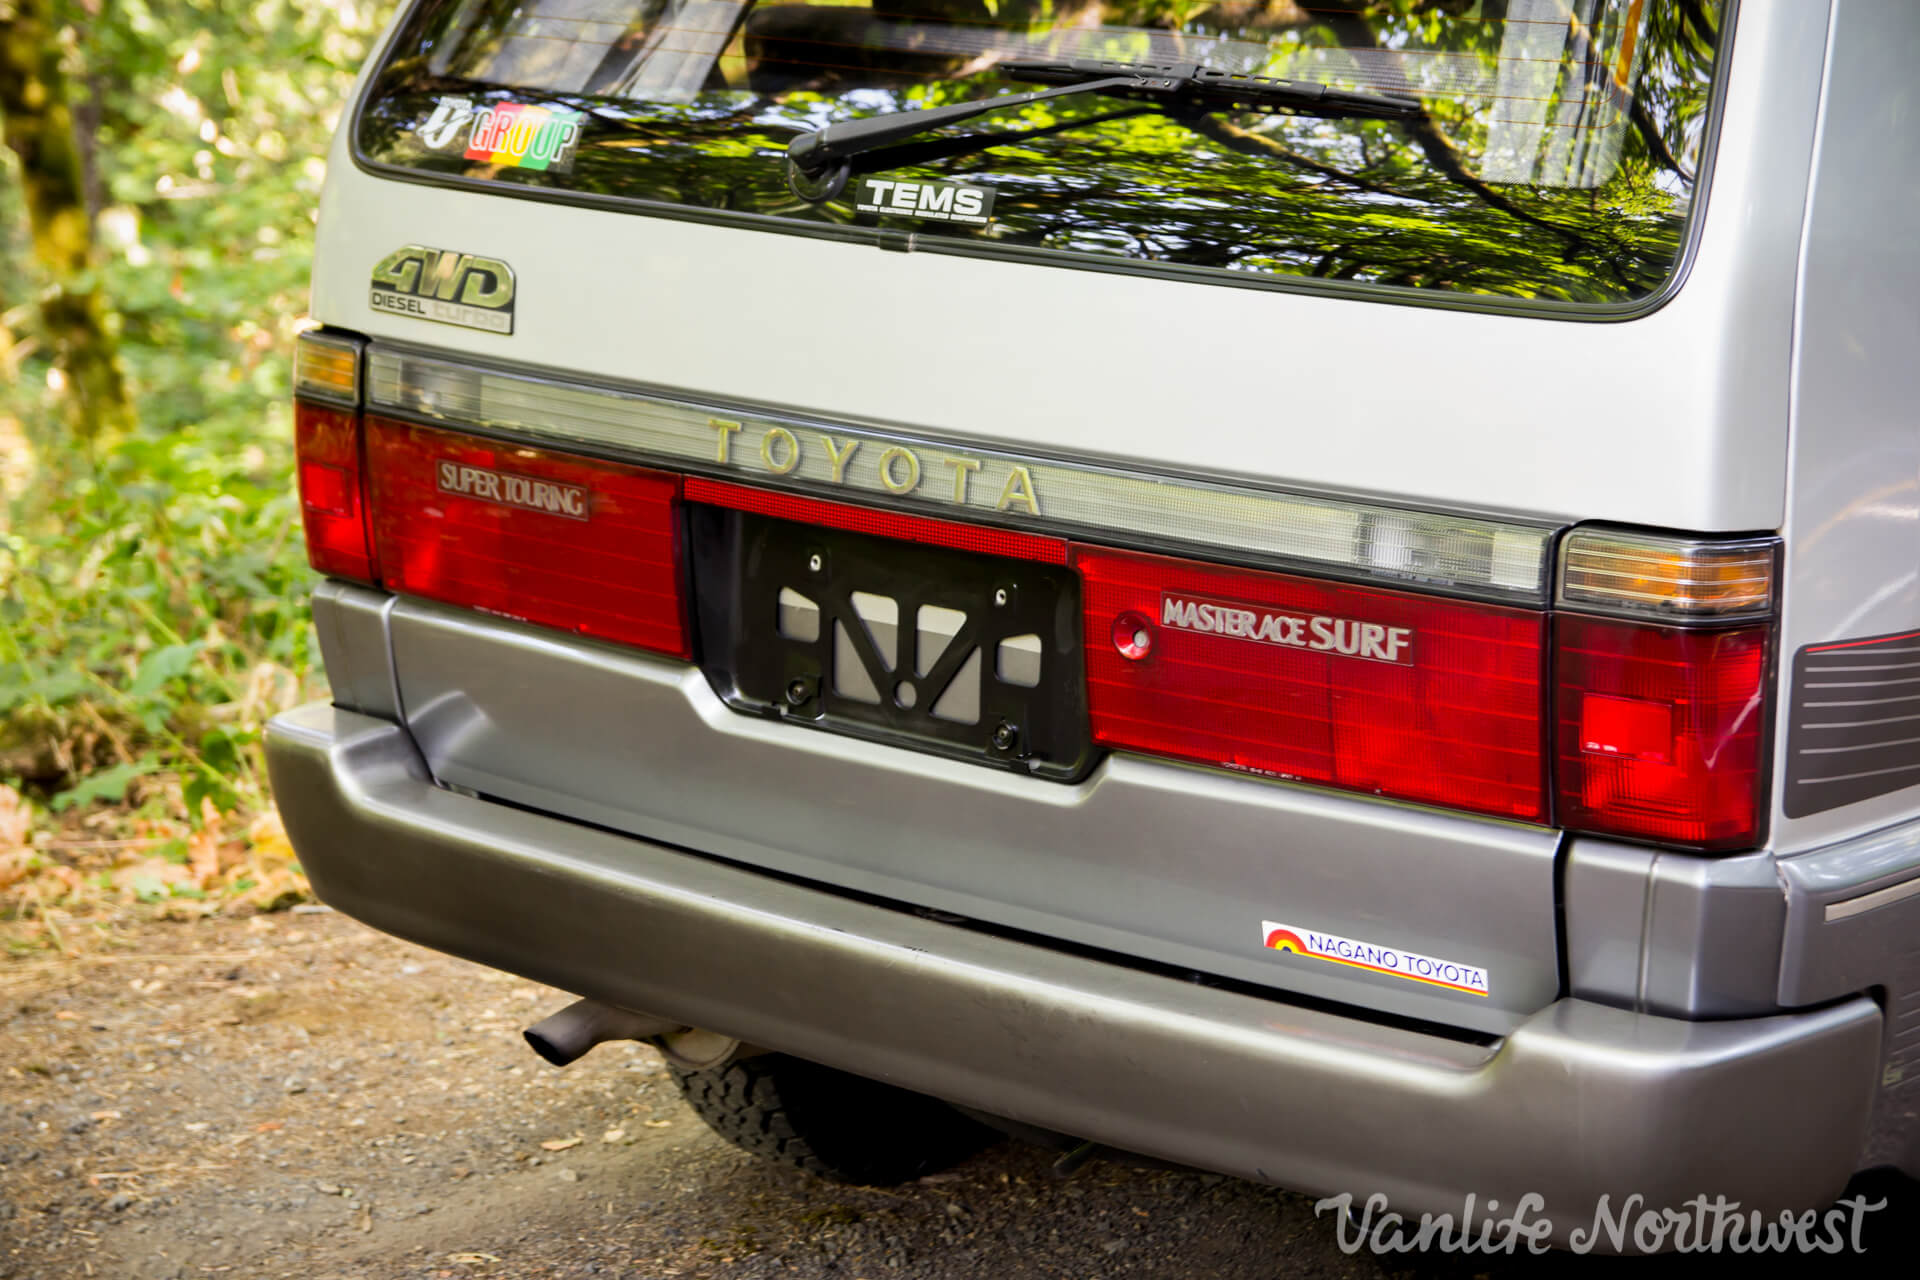 ToyotaCR30SilverRick-5.jpg